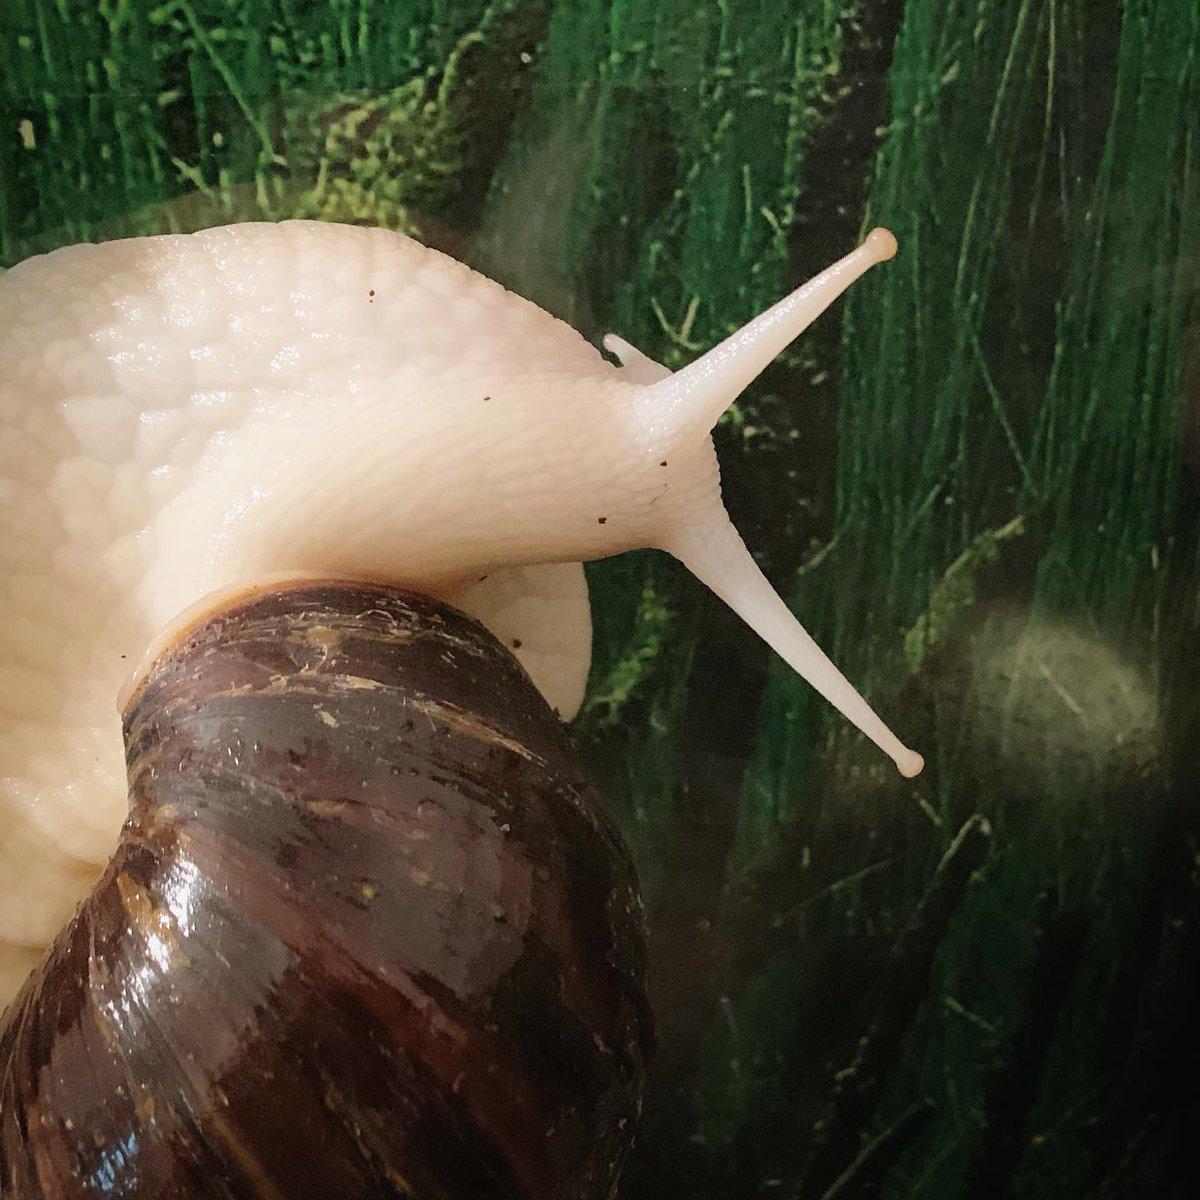 What you looking at, Cakepop? #snails #snailsofinstagram #achatina #achatinafulica #achatinasnail #latergram pic.twitter.com/DGc4YBDkTr